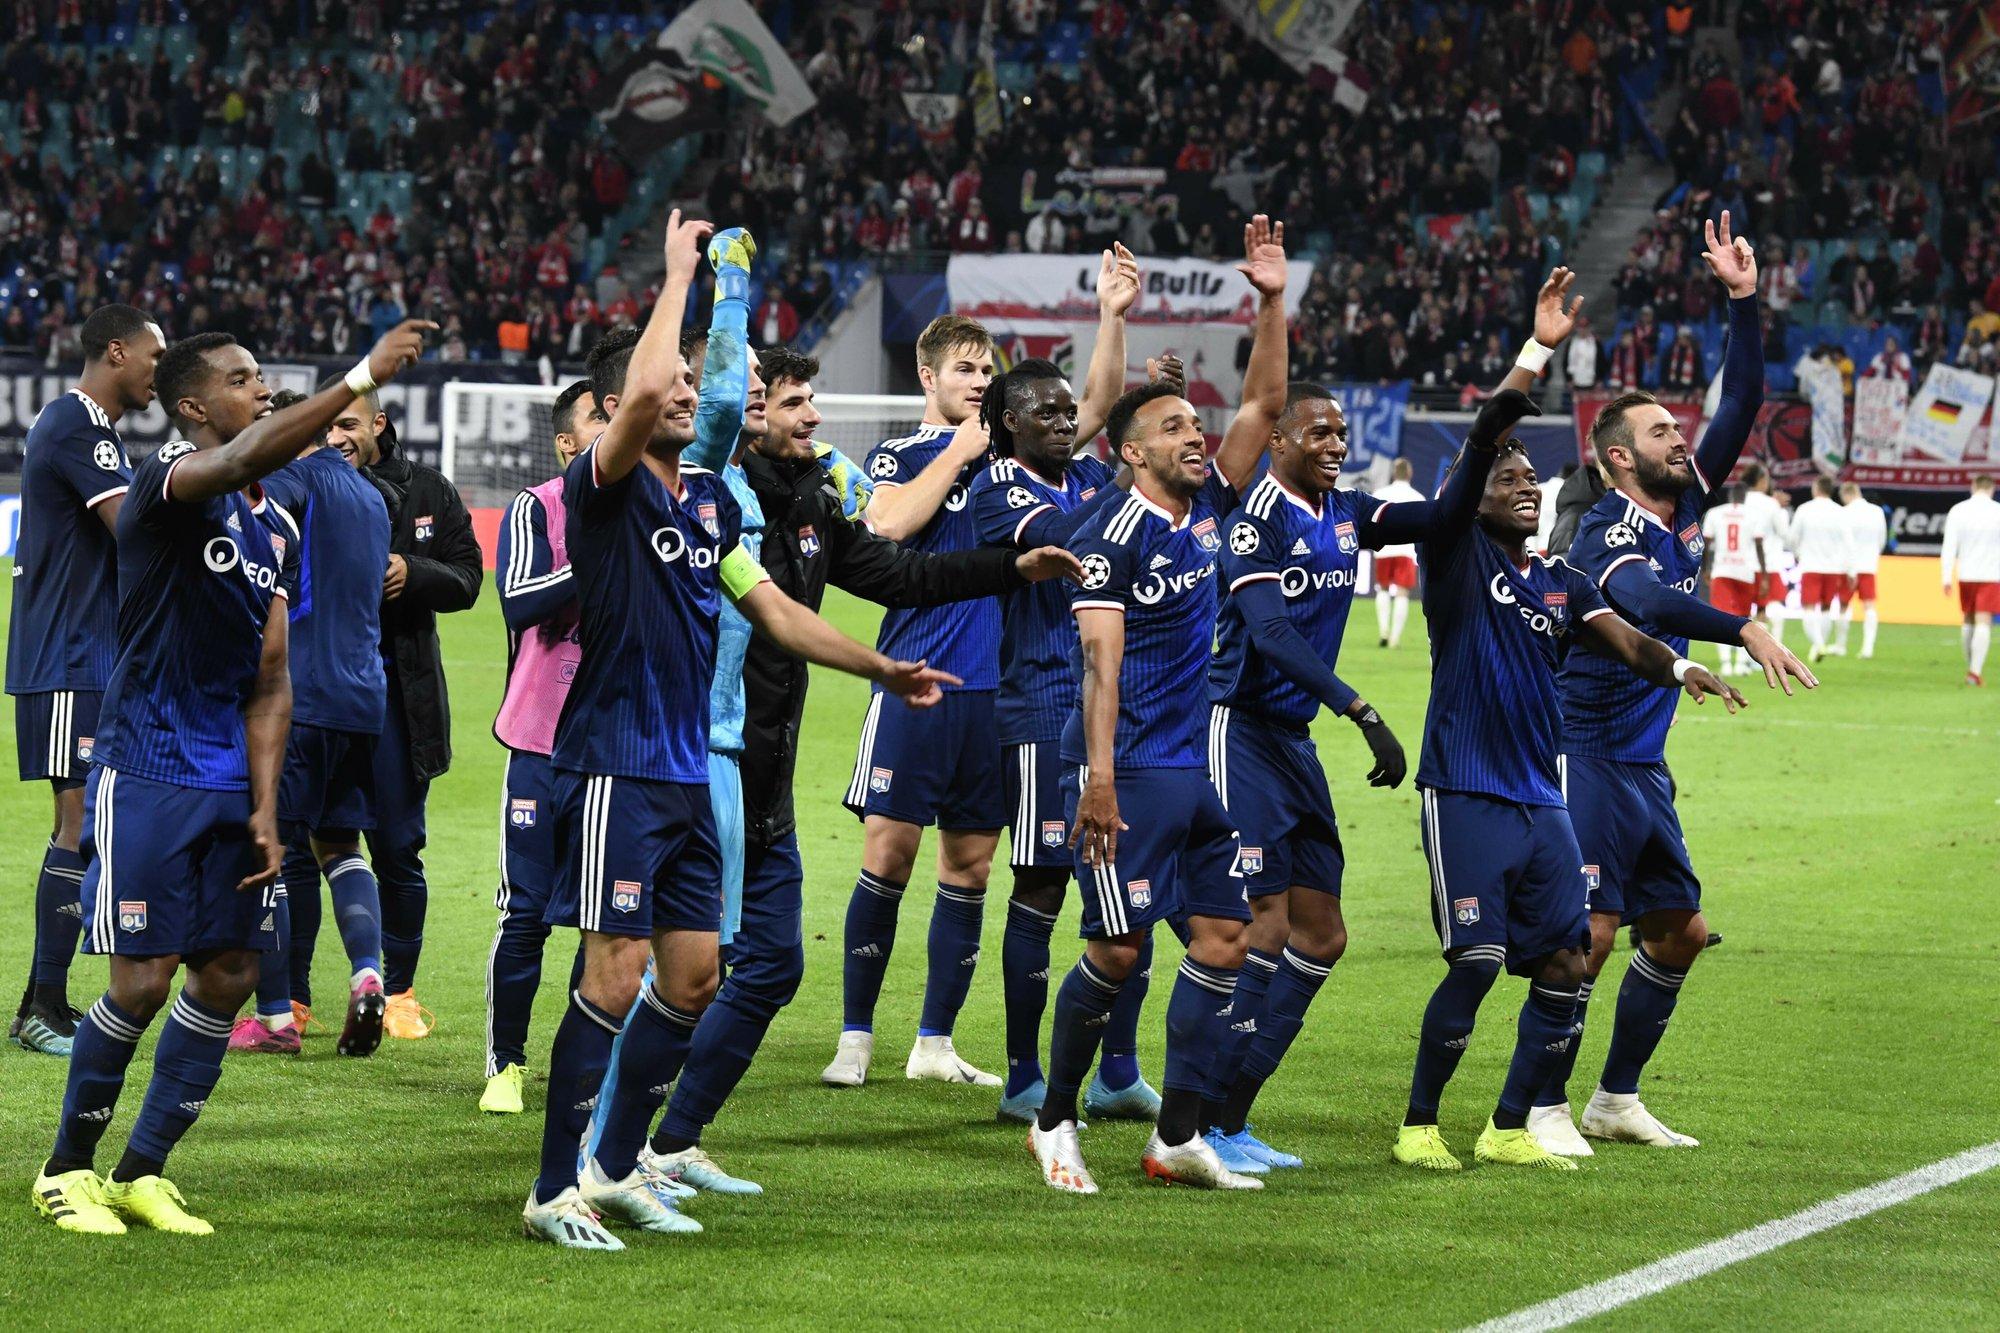 After Mourinho says no, Lyon hires Rudi Garcia as coach